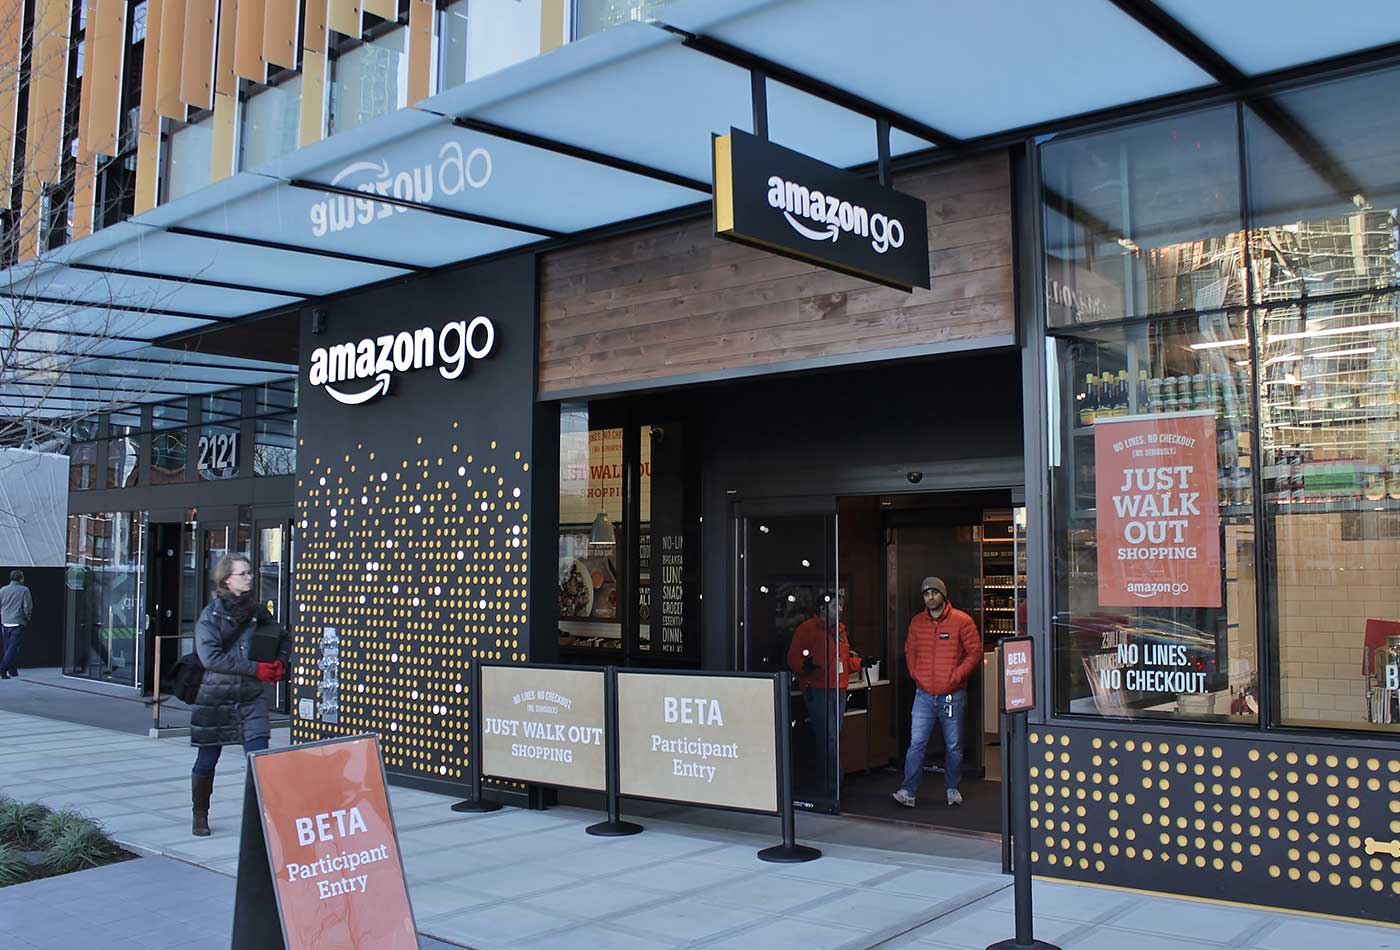 The Amazon Go store at Day One, Seattle, Washington